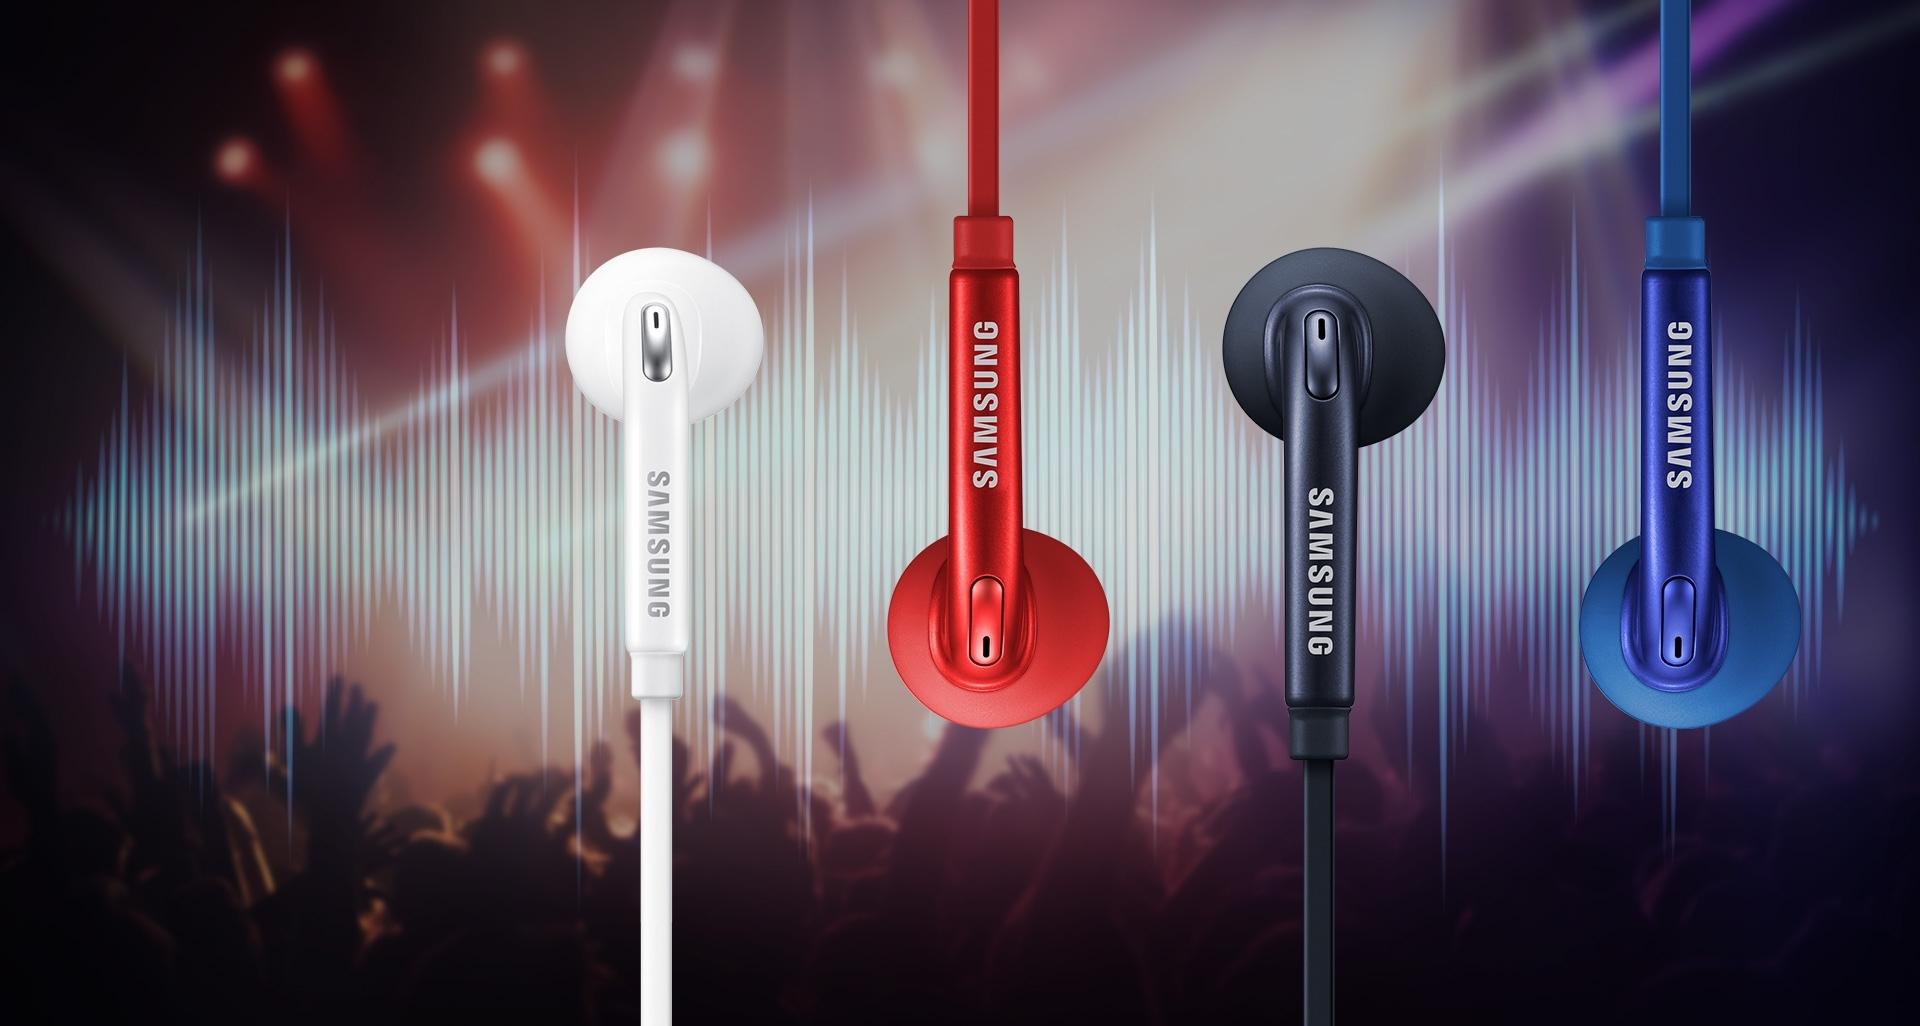 Ecouteur Samsung  In Ear Fit EO-EG920B  Prix tunisie